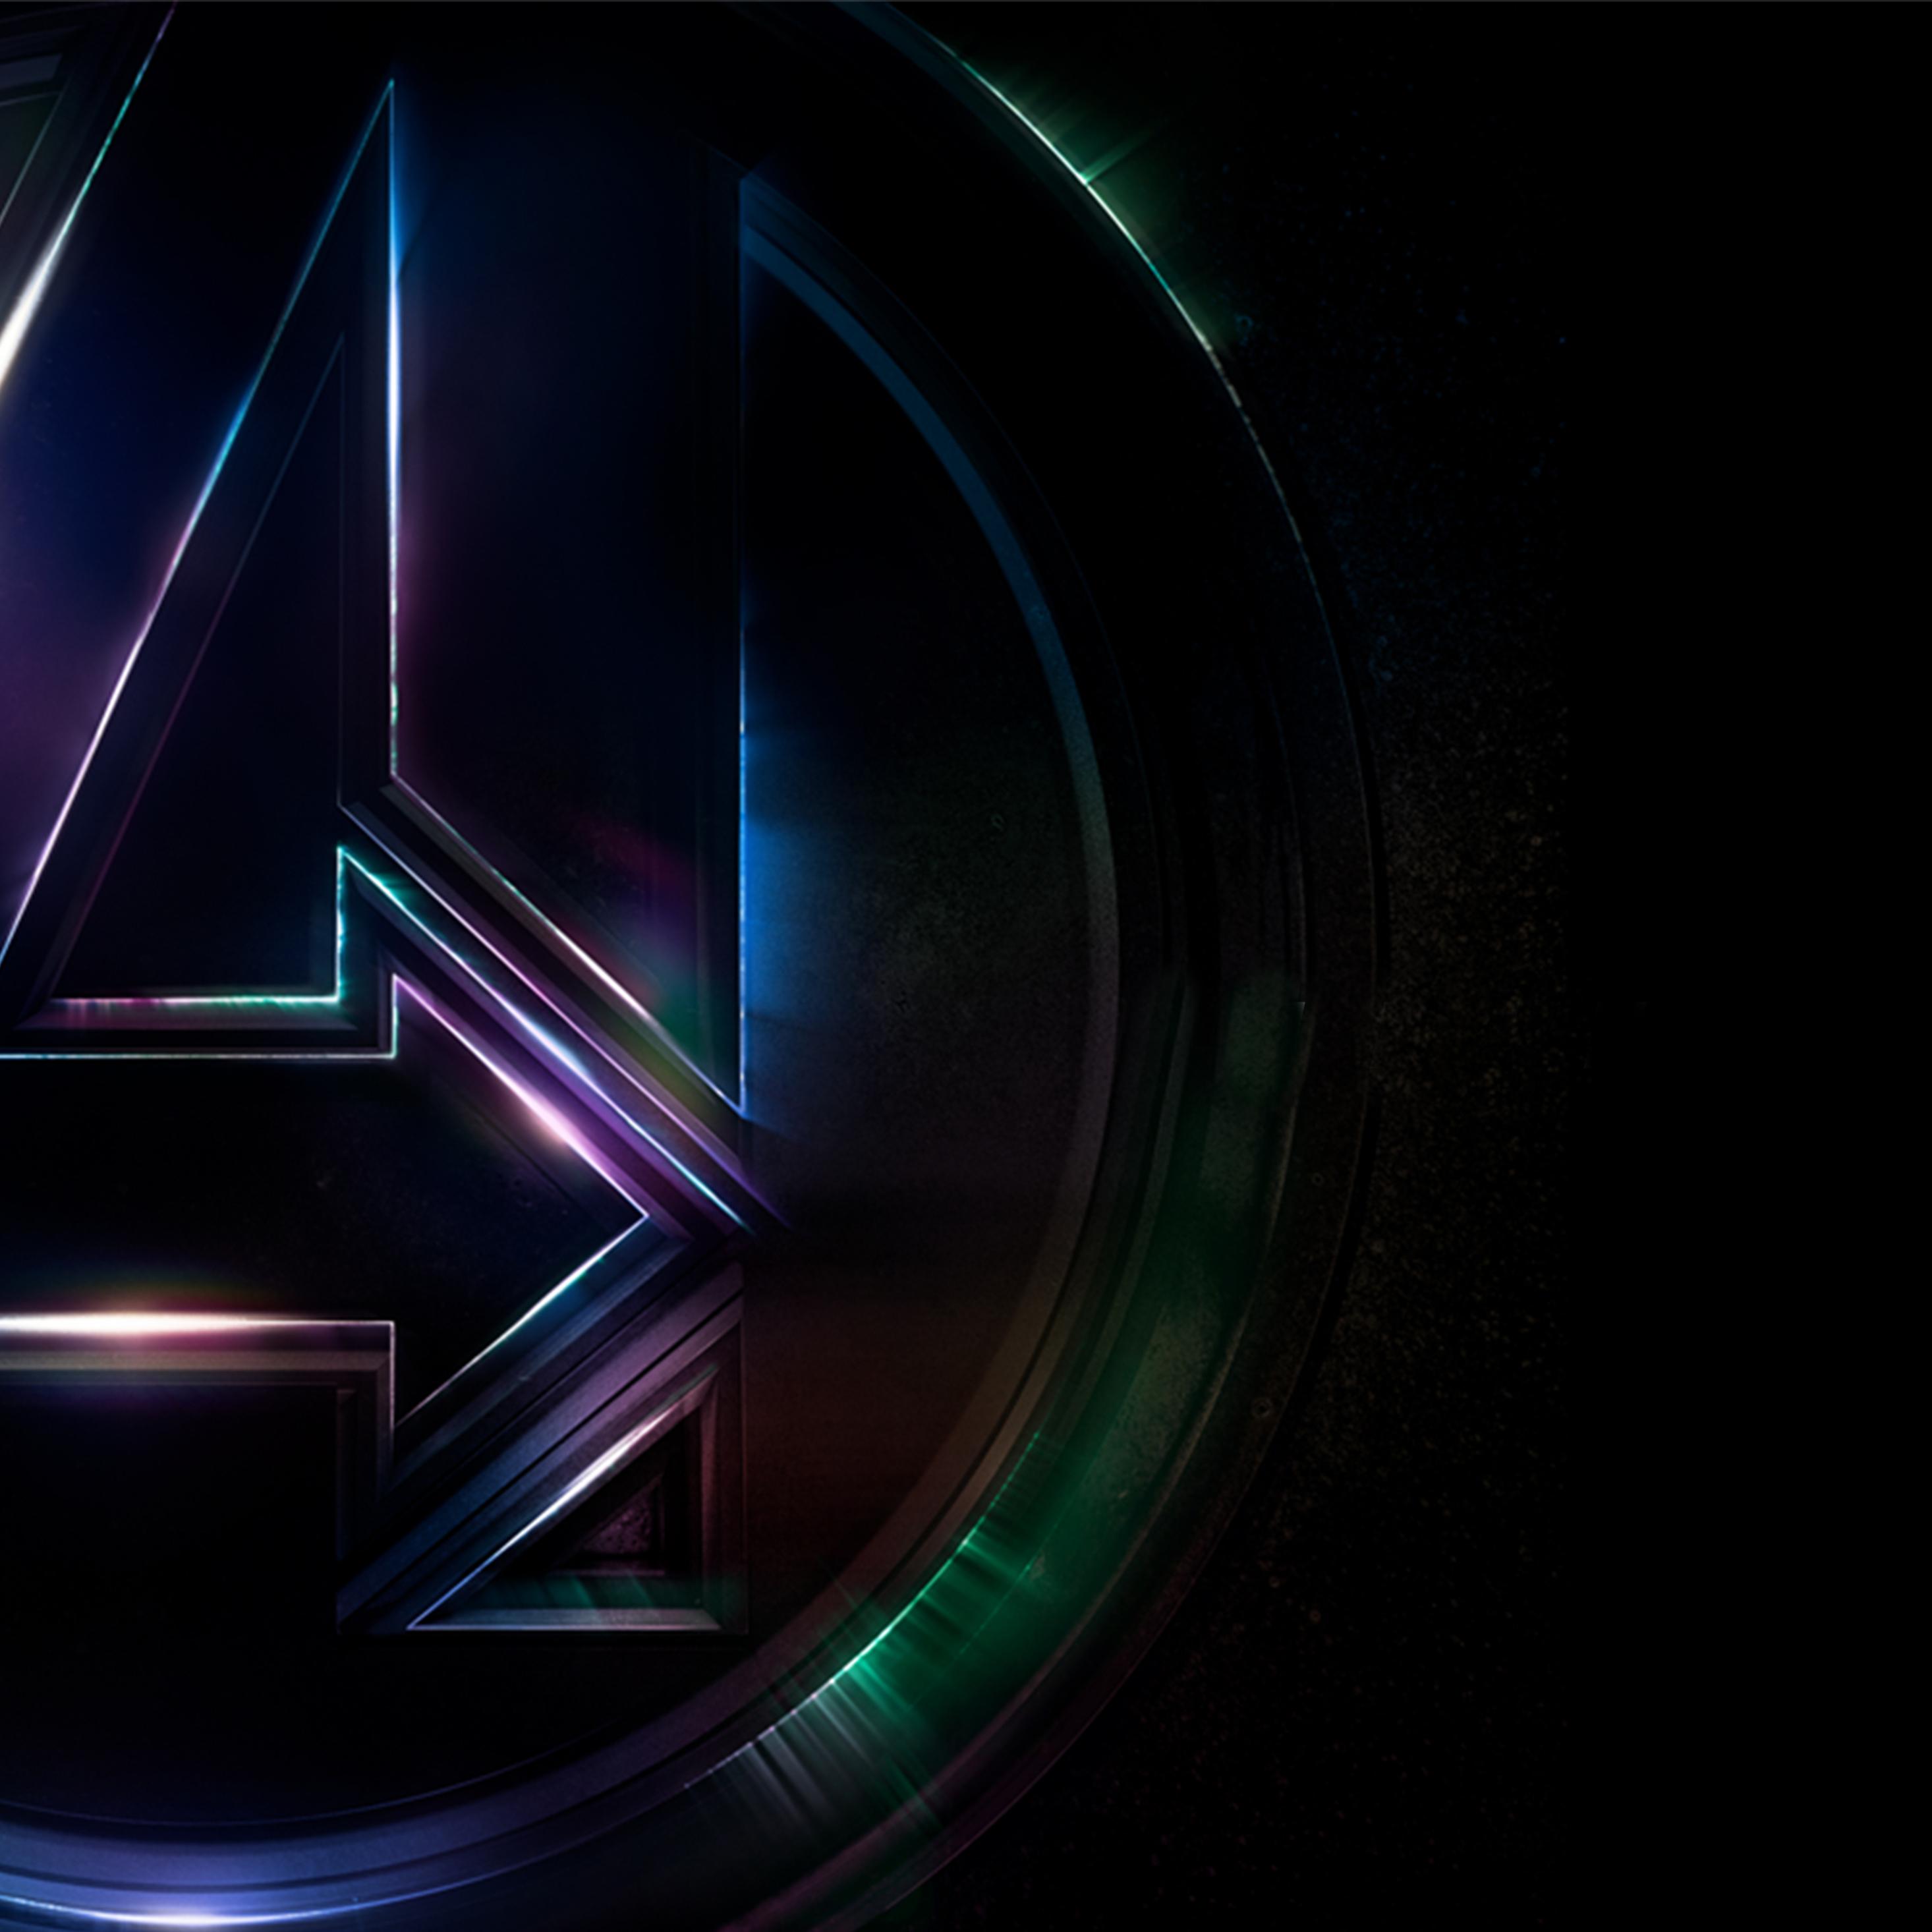 2932x2932 Avengers Infinity War 4k Logo Poster Ipad Pro ...